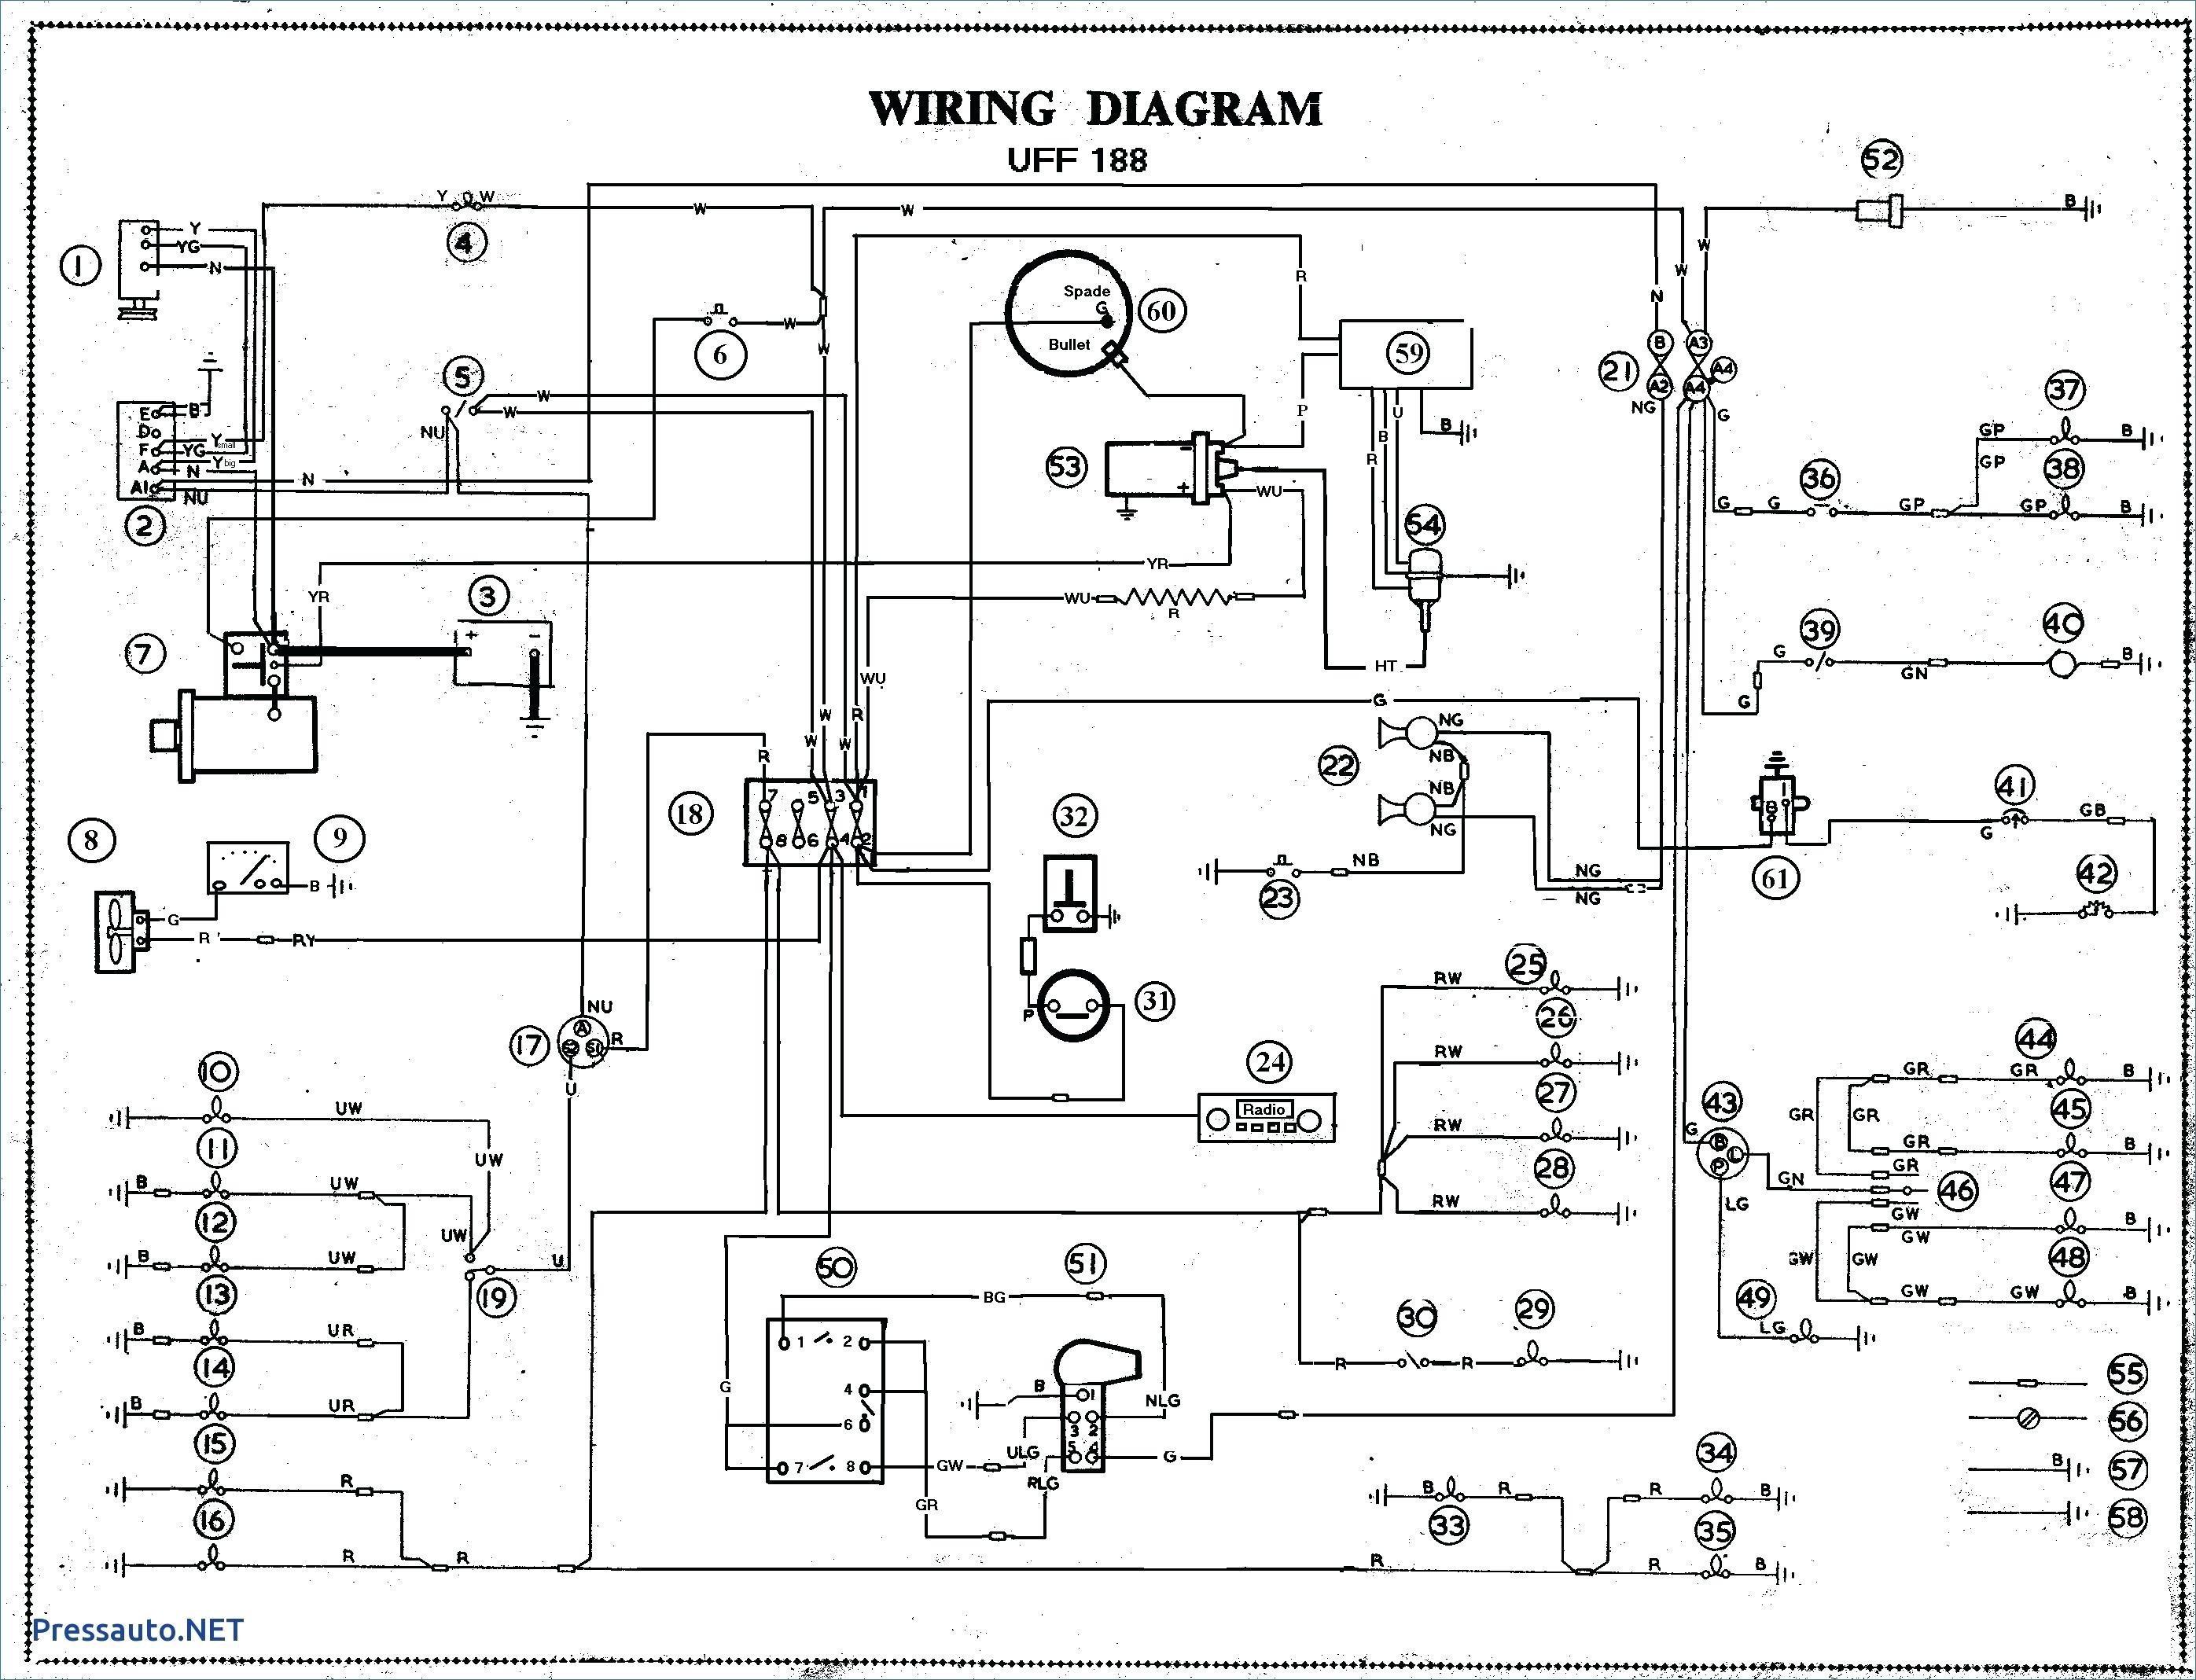 Bulldog Security Wiring Diagram Best Of Car Diagrams Random - Bulldog Security Wiring Diagram